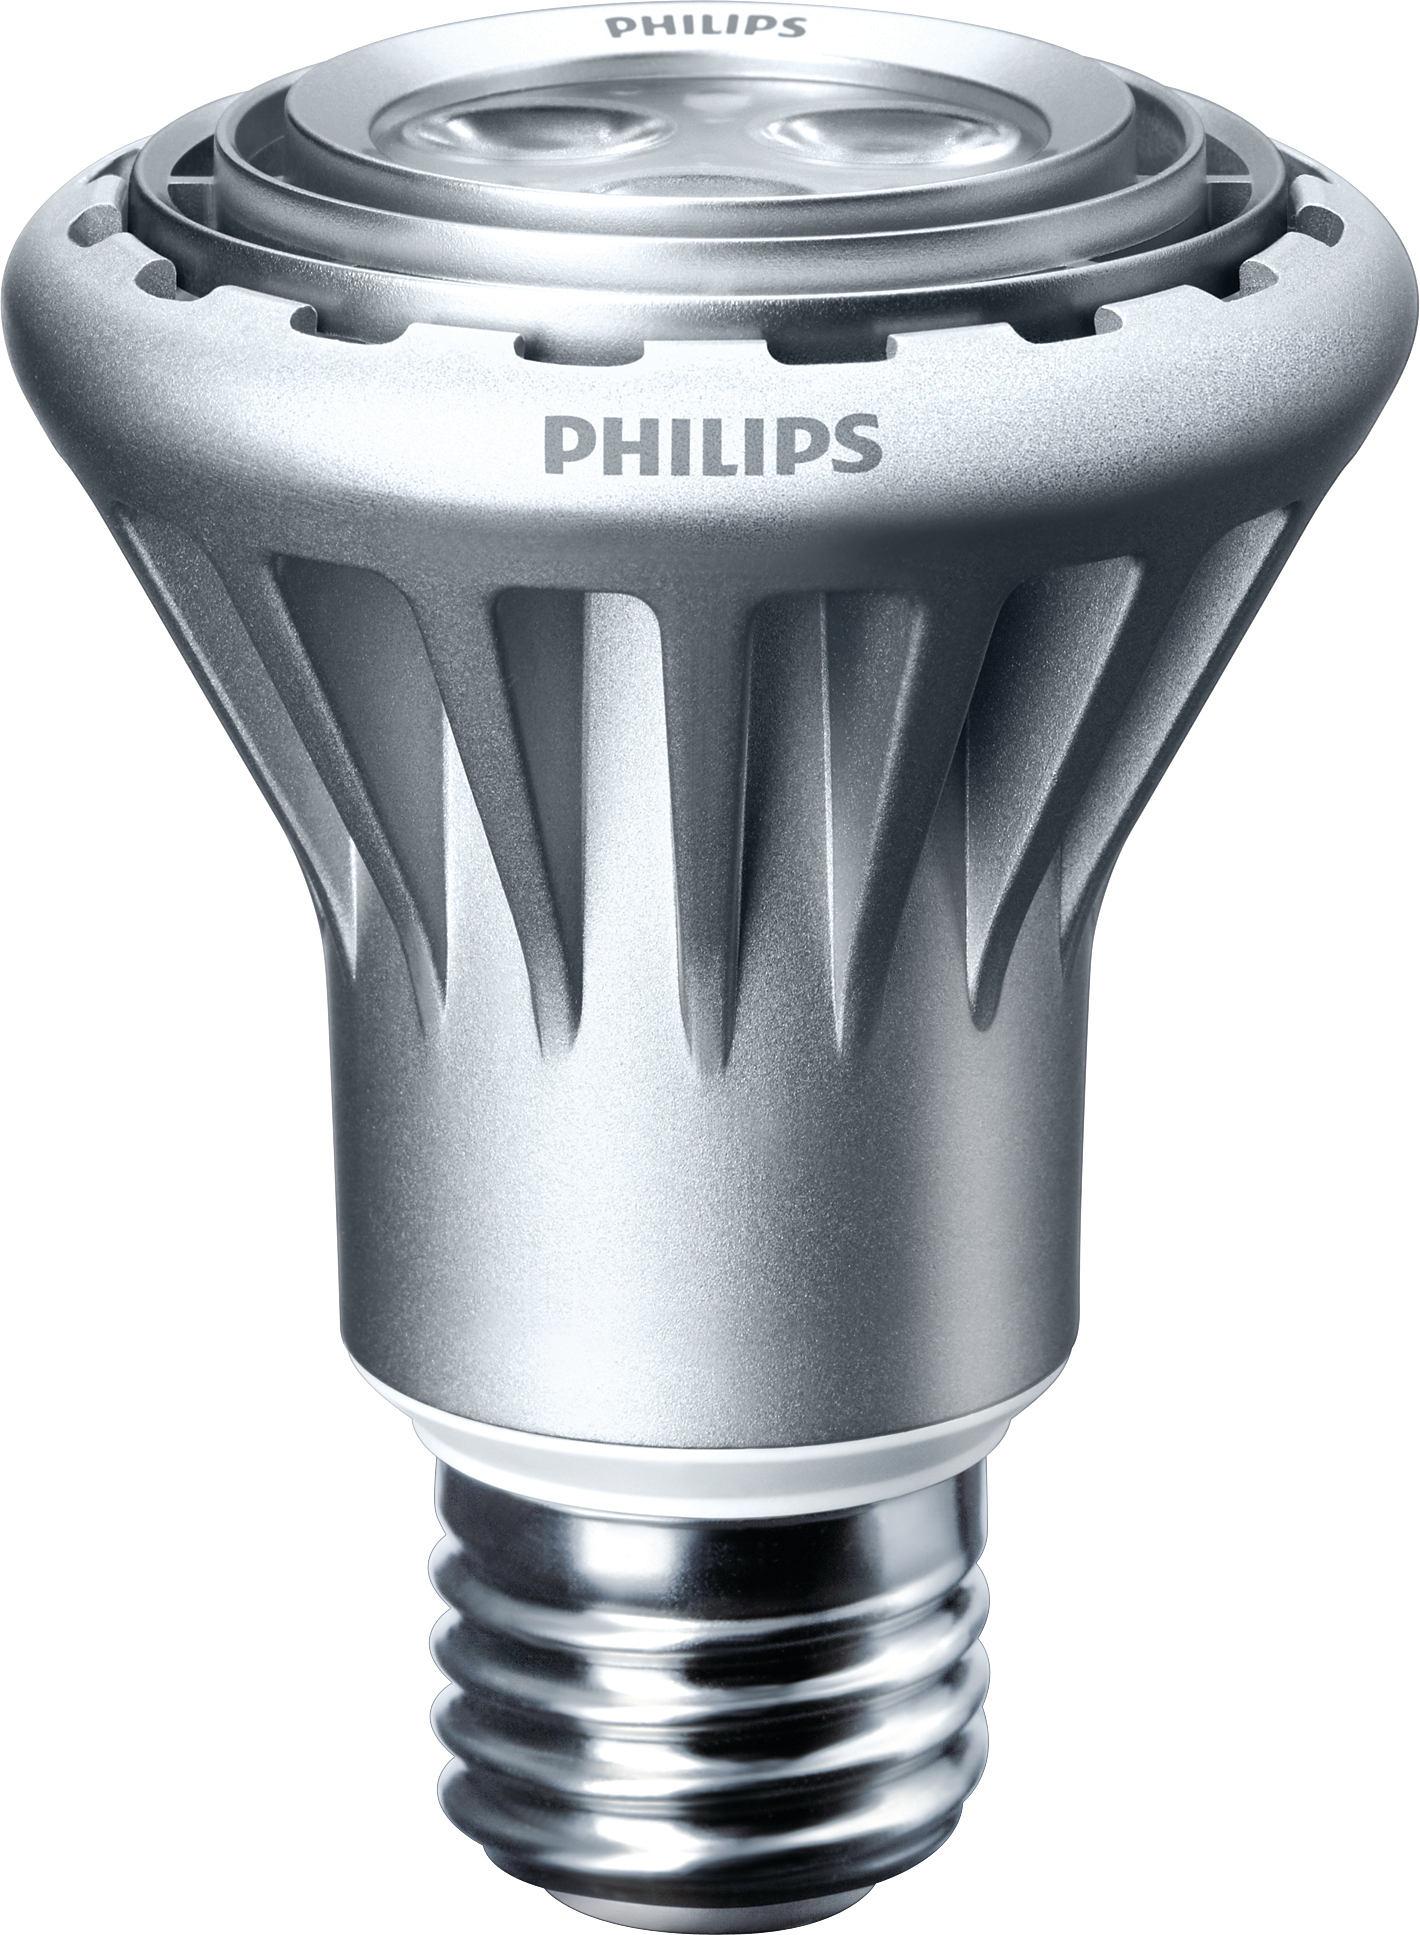 philips led lampen 2 stuks philips dimbare led lampen elke philips led lampen images led. Black Bedroom Furniture Sets. Home Design Ideas